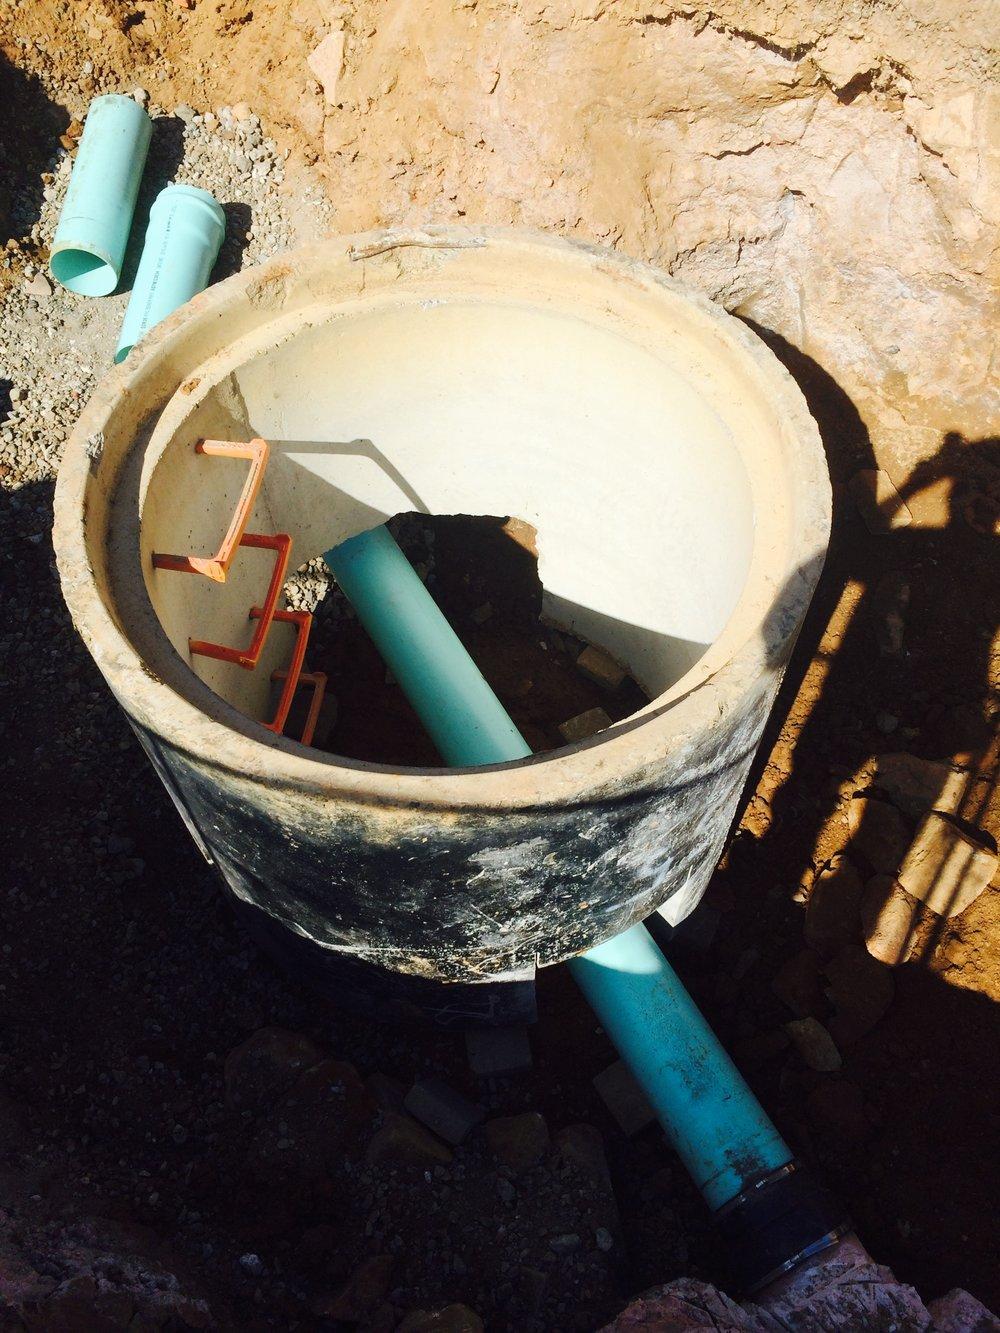 Neumann - Sanitary Sewer